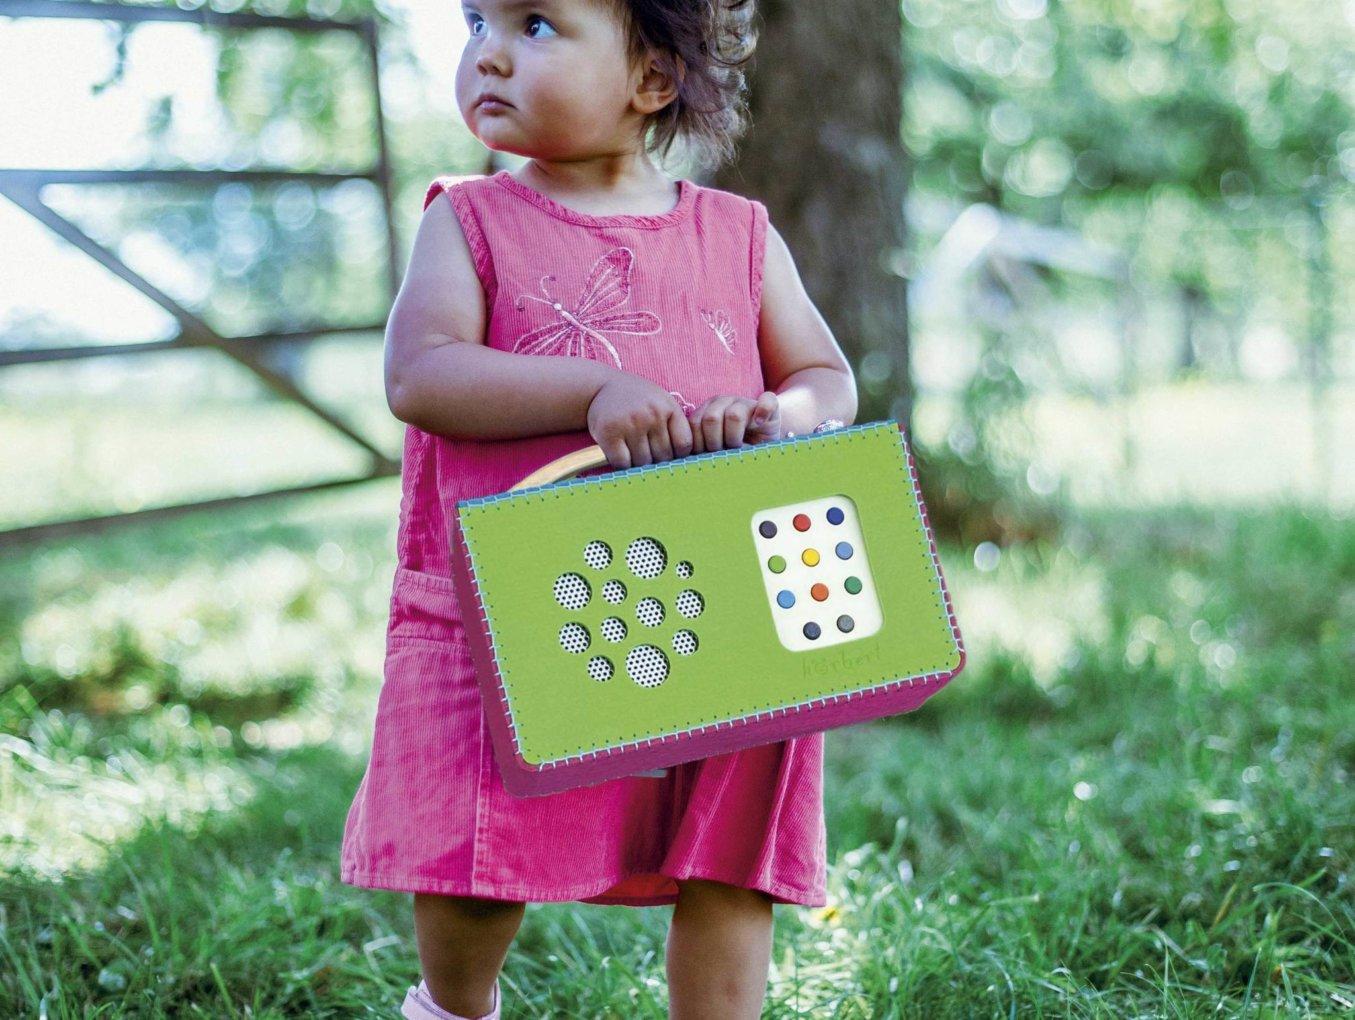 Neues Produkt erhältlich: Filztasche MIX handgenäht